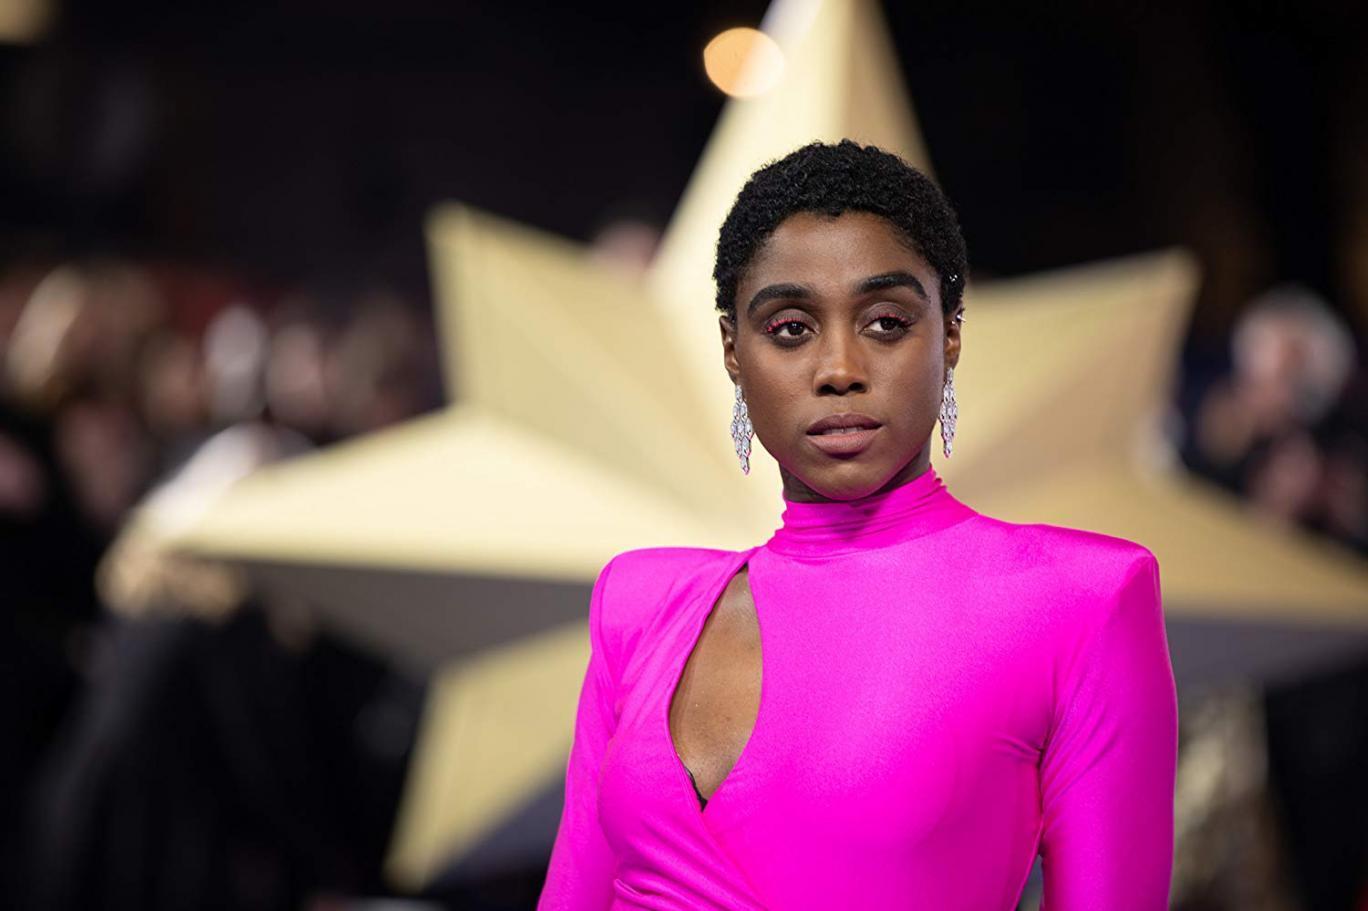 Yeni 007 siyahi kadın oyuncu Lashana Lynch